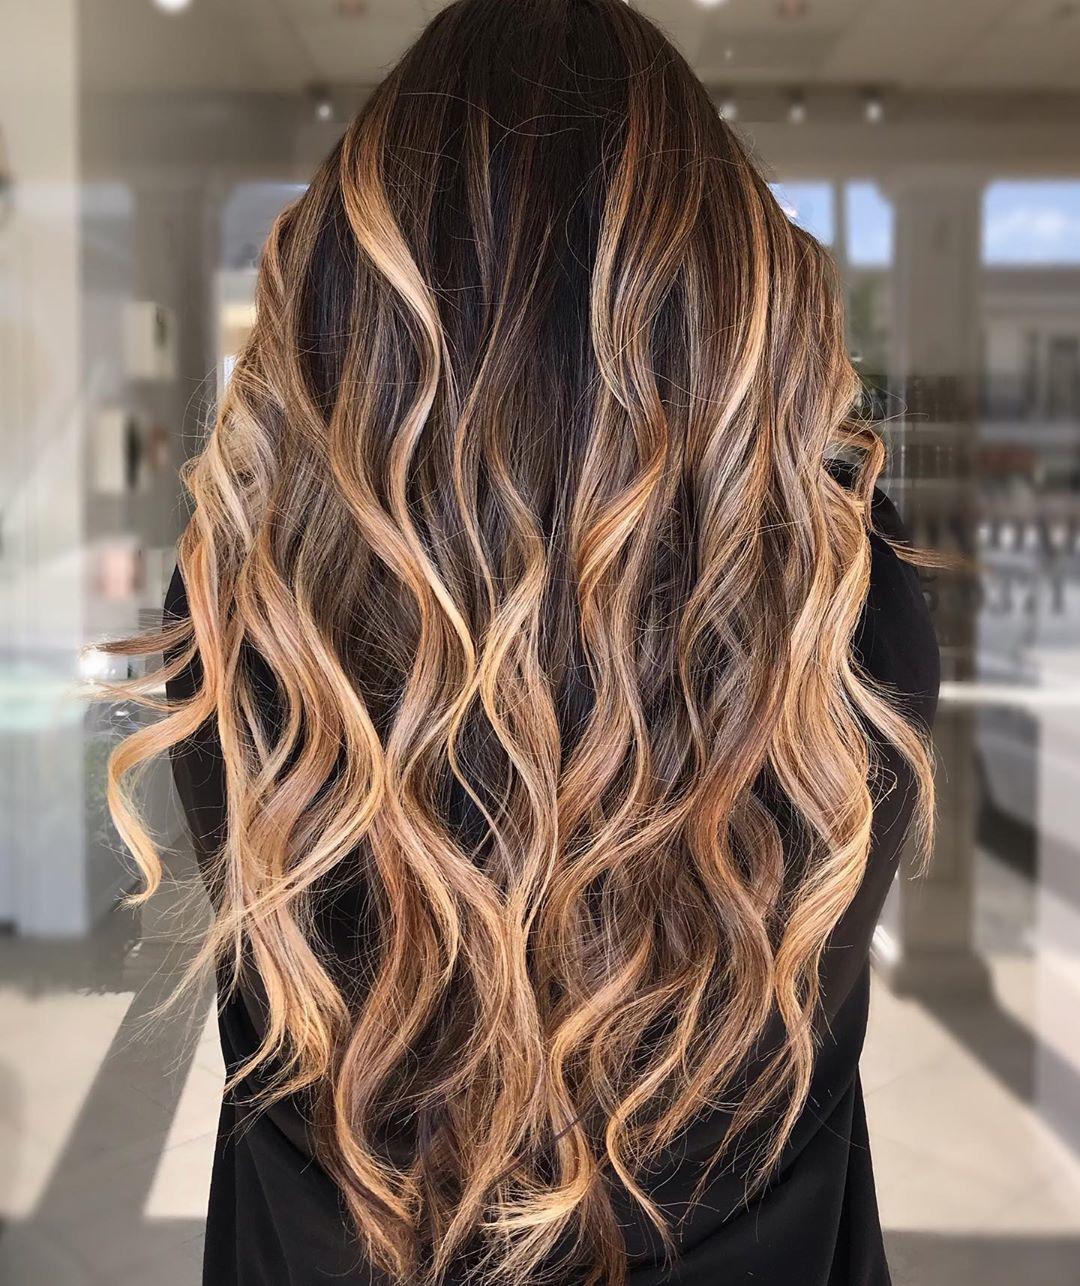 Woman with long curly bronde balayage hair